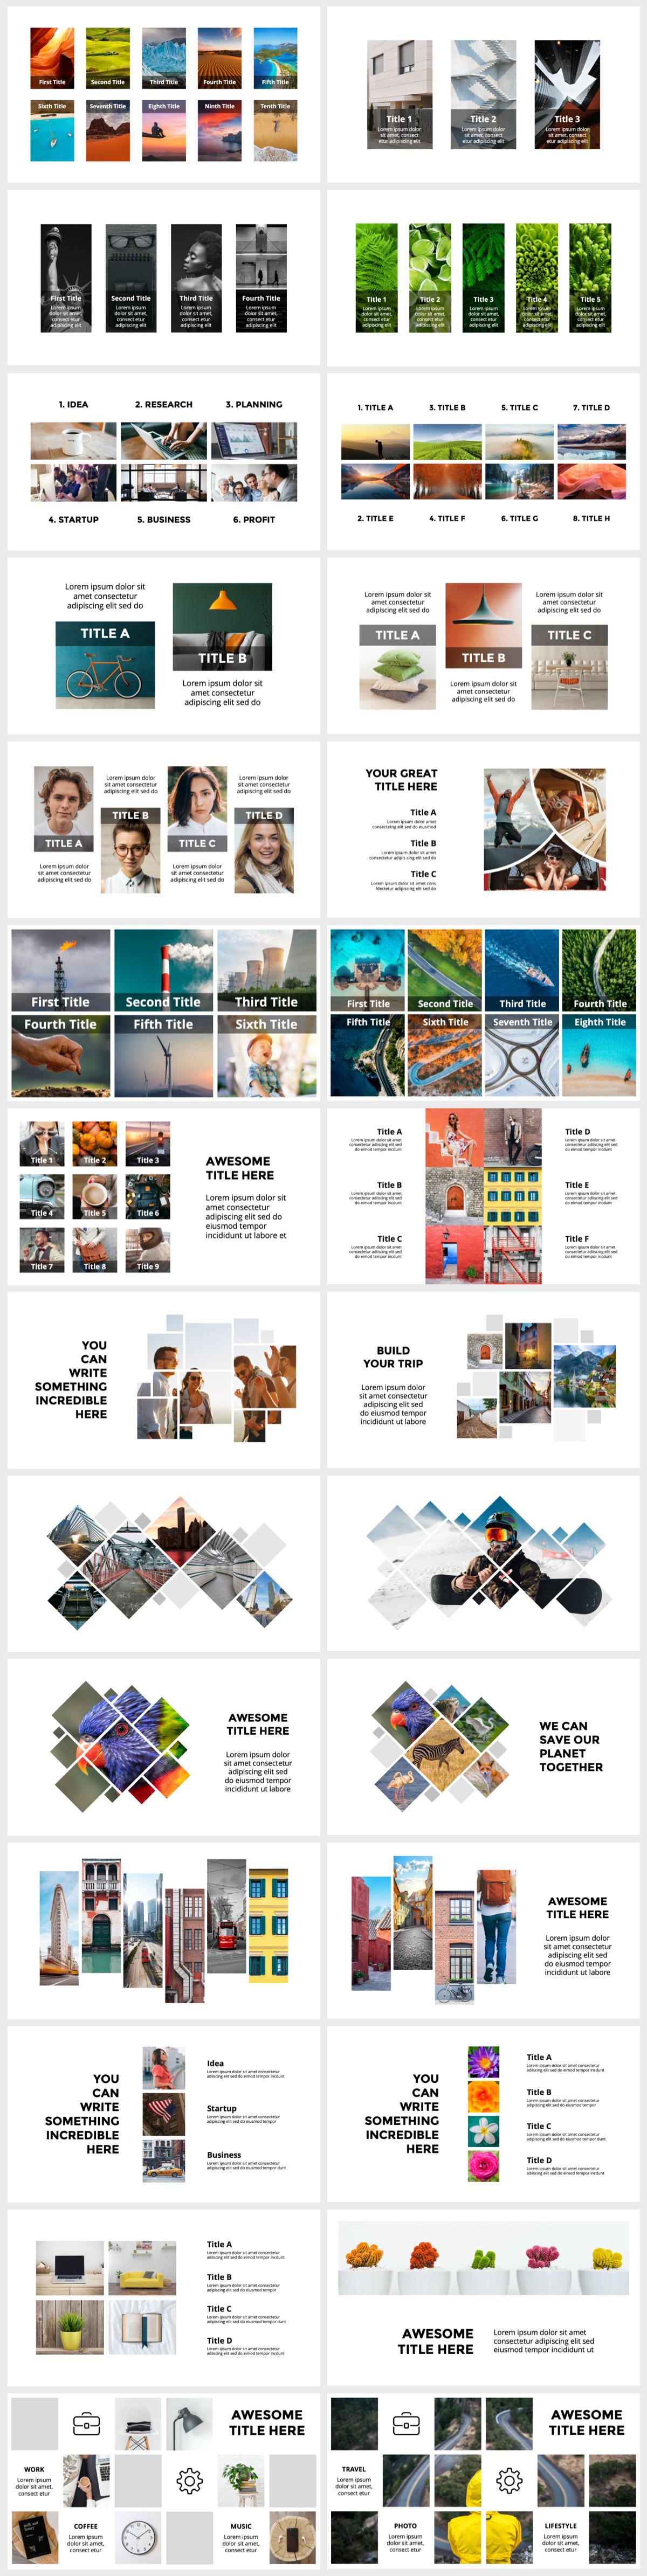 Huge Infographics Bundle! Lifetime Updates! PowerPoint, Photoshop, Illustrator. - 124